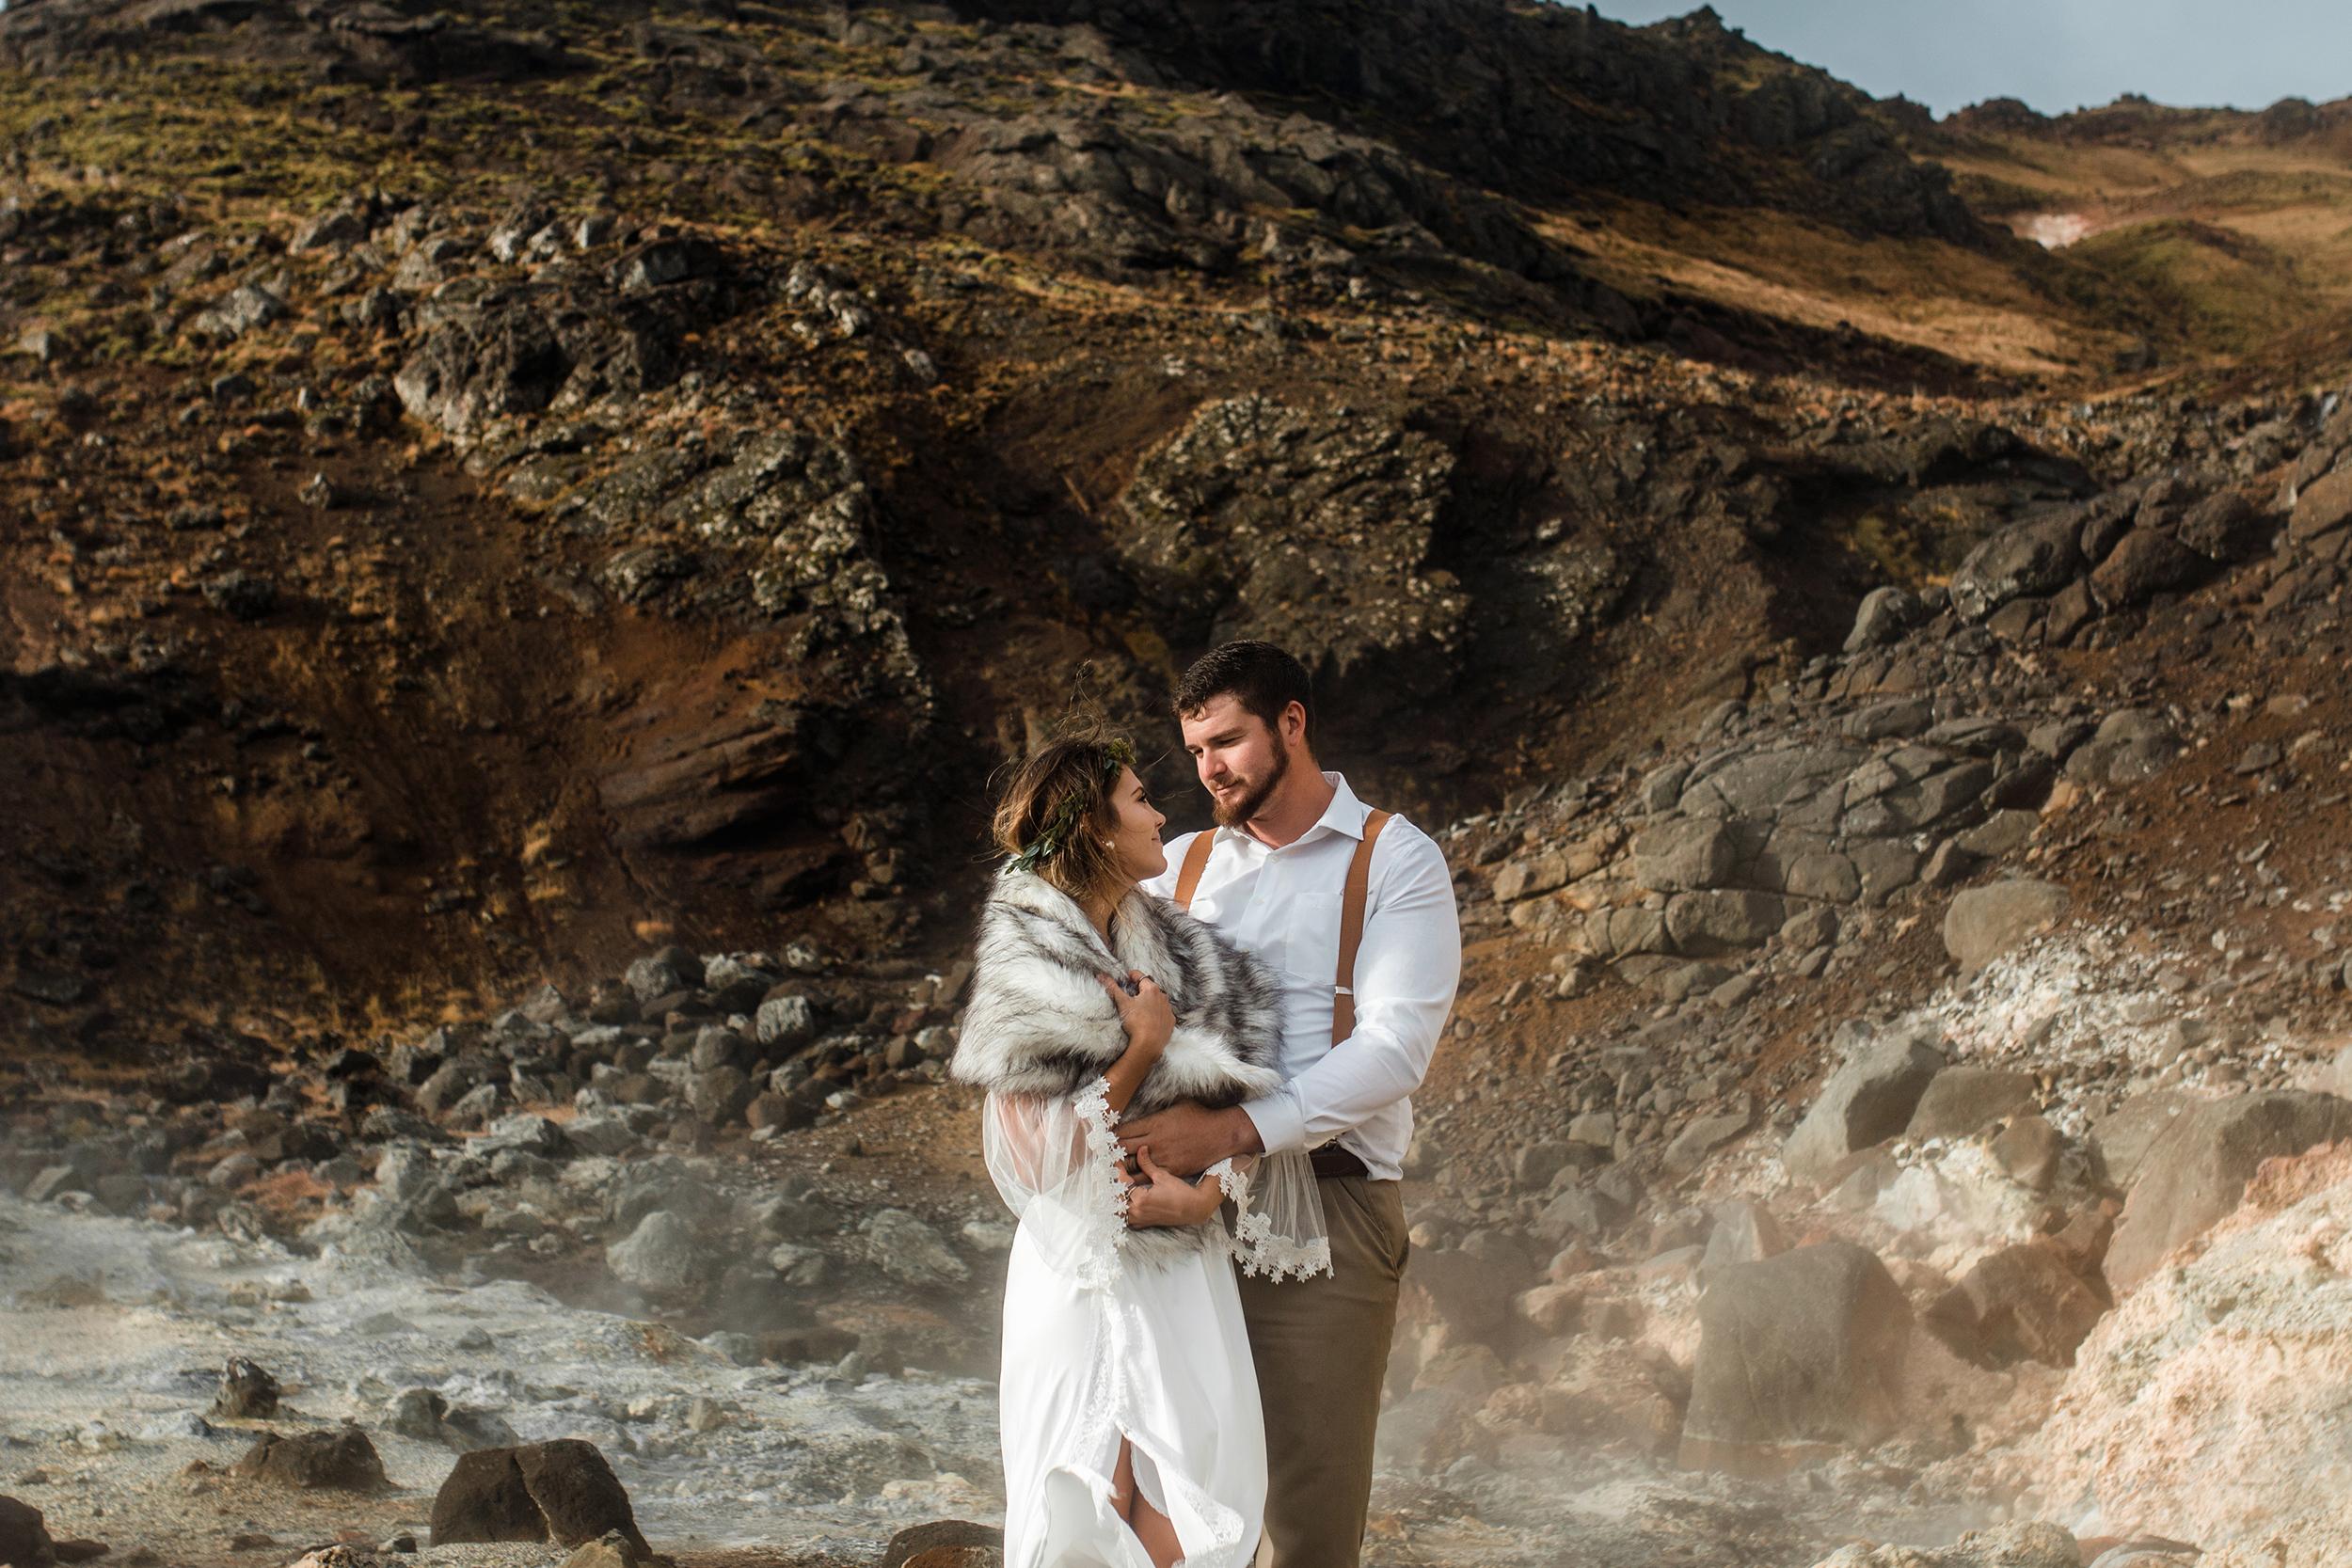 Iceland Elopement Portrait Photographer Best Price Destination Photographer Faroe Islands Greenland Scotland Scandinavia